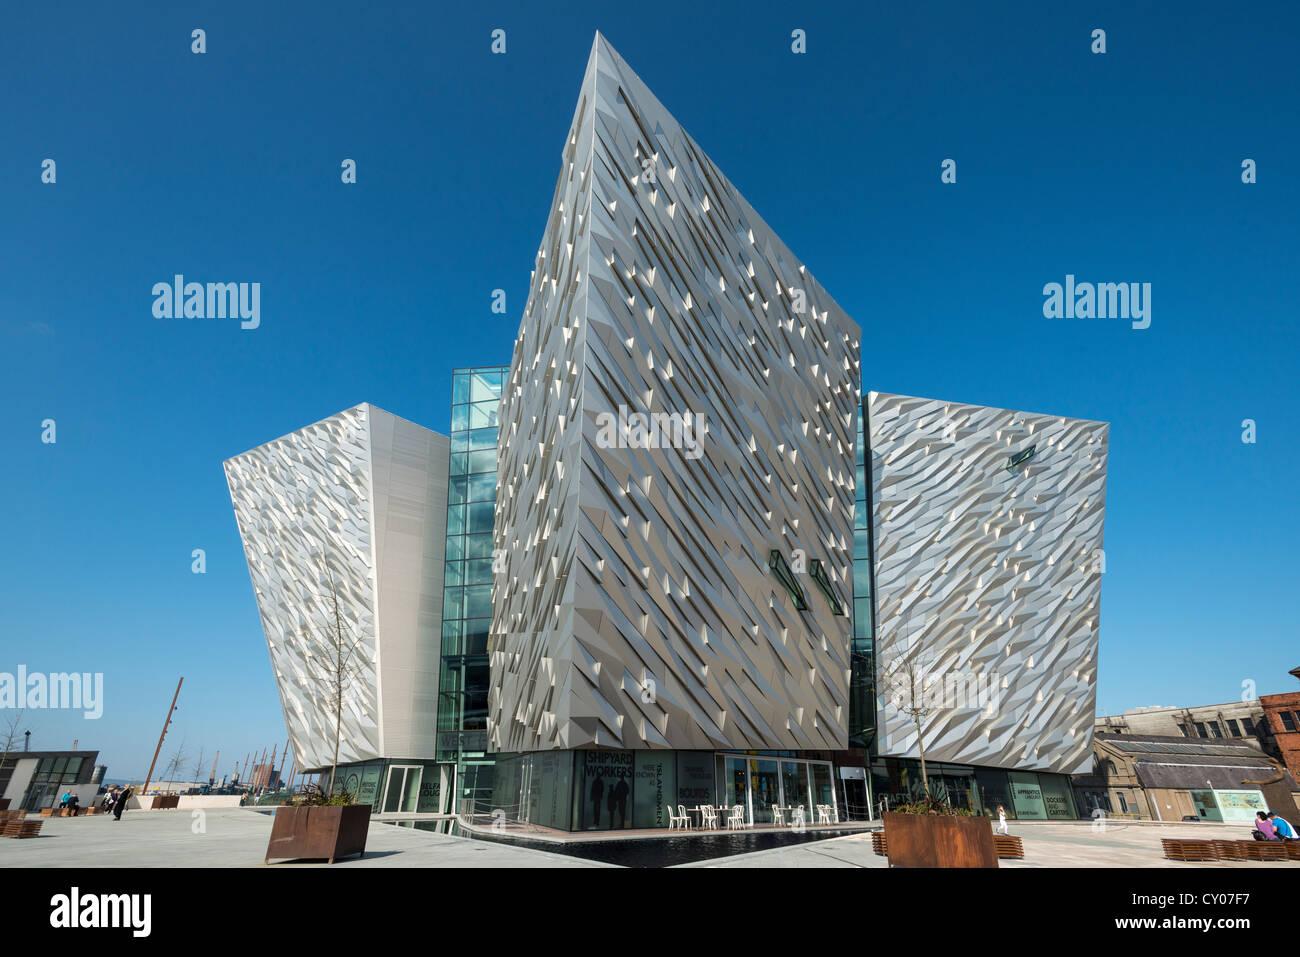 Titanic Museum, Titanic docks, Belfast, Northern Ireland, United Kingdom, Europe - Stock Image